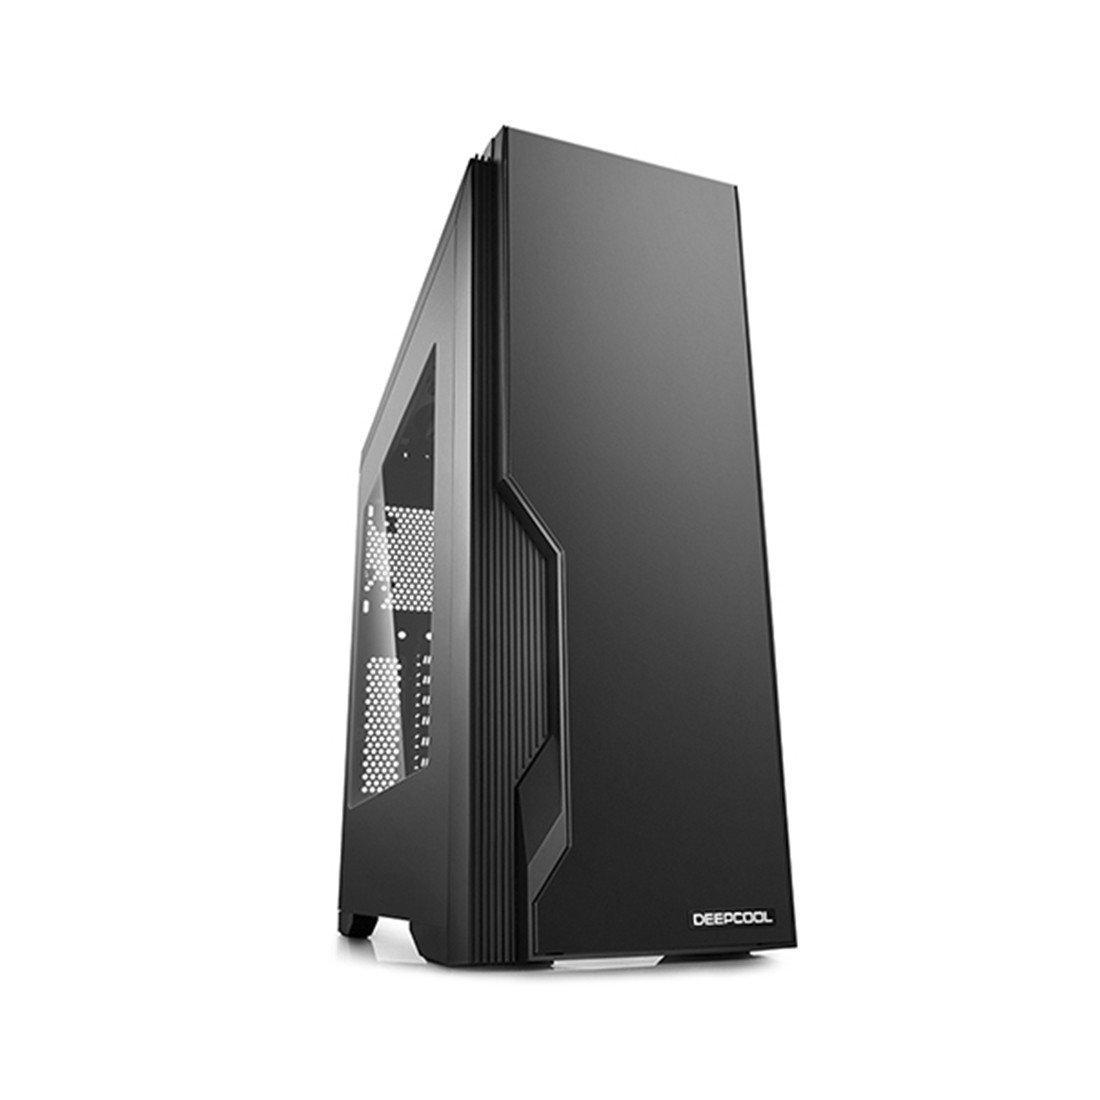 Системный блок Intel Core i3-7100 3.9GHZ/H110/DDR4 4GB/SSD 120GB/450W